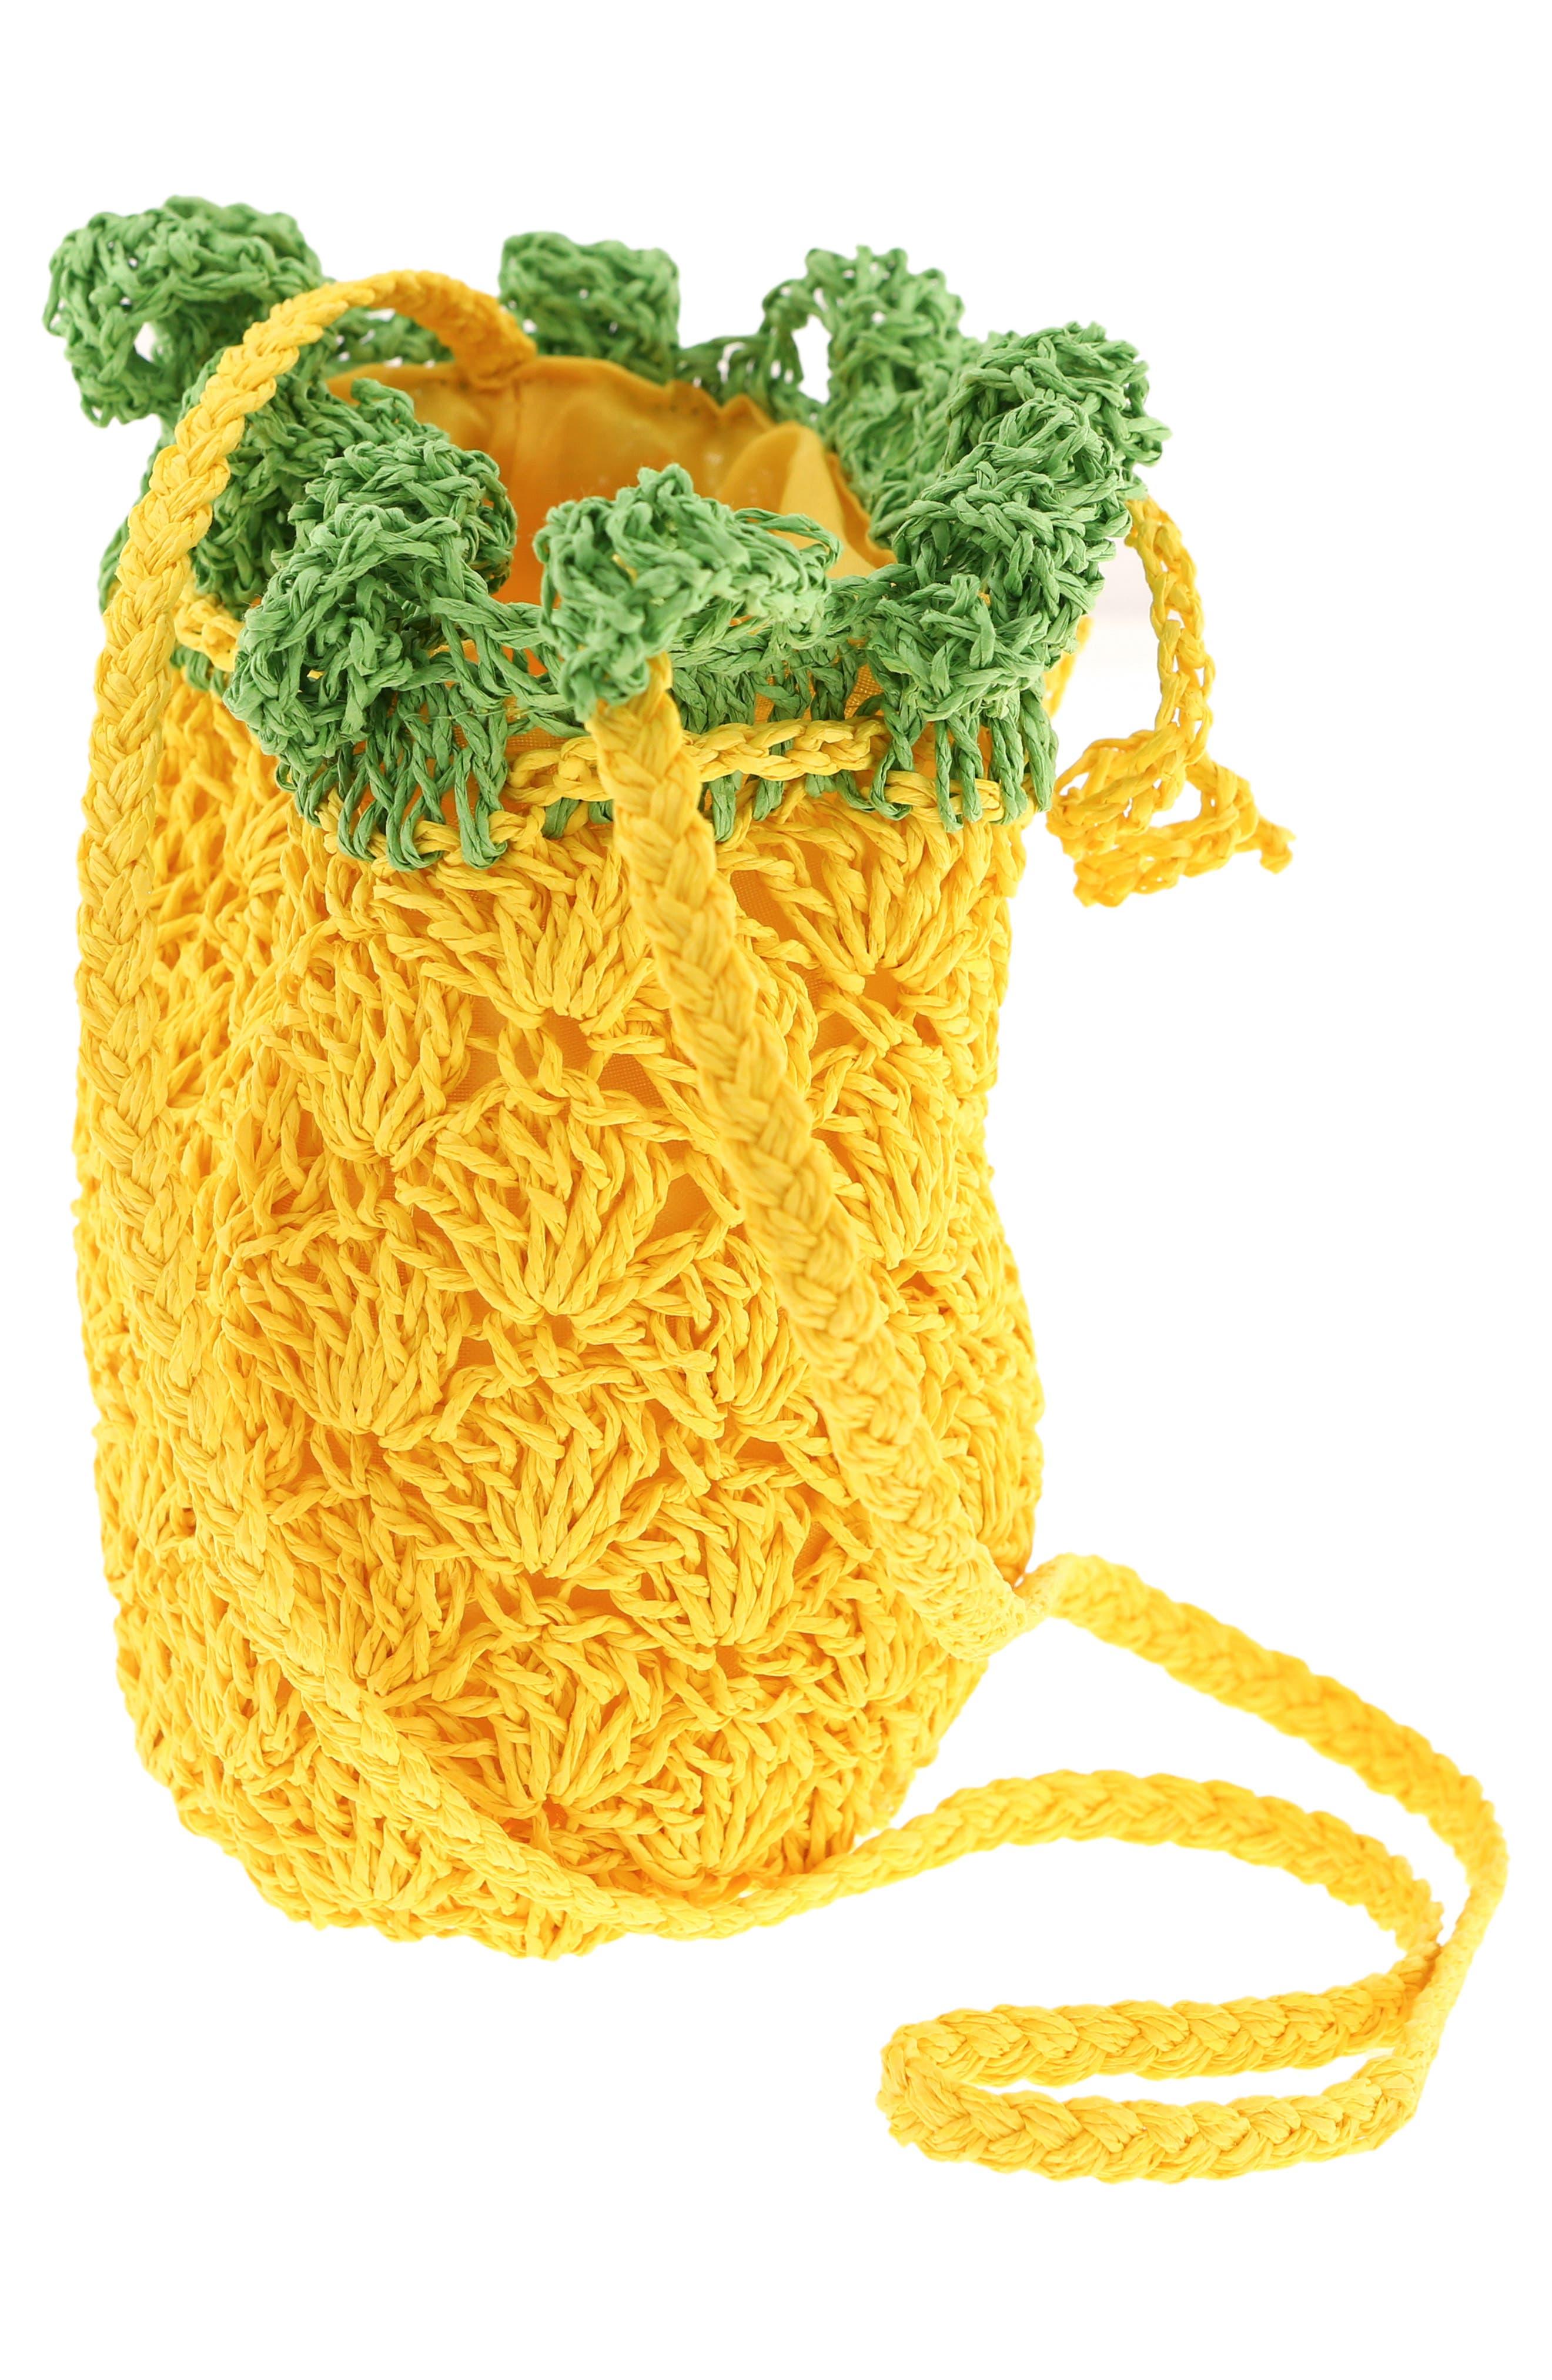 CAPELLI NEW YORK, Crochet Pineapple Crossbody Bag, Alternate thumbnail 3, color, YELLOW COMBO